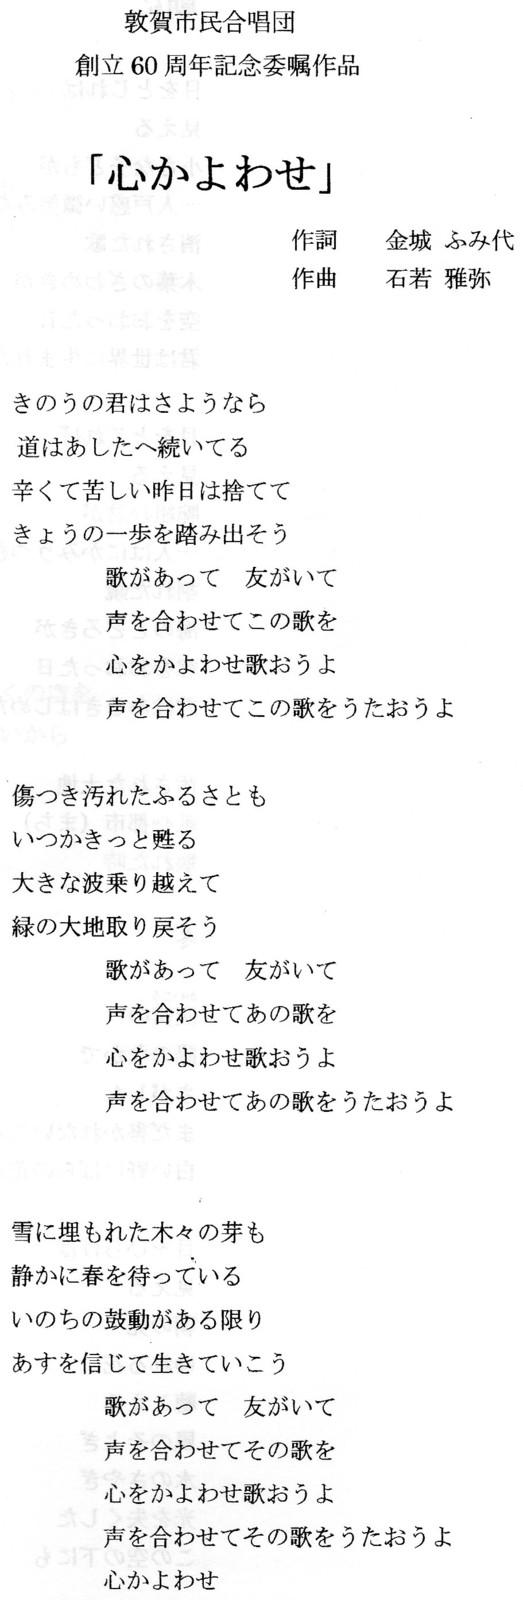 Img237_3